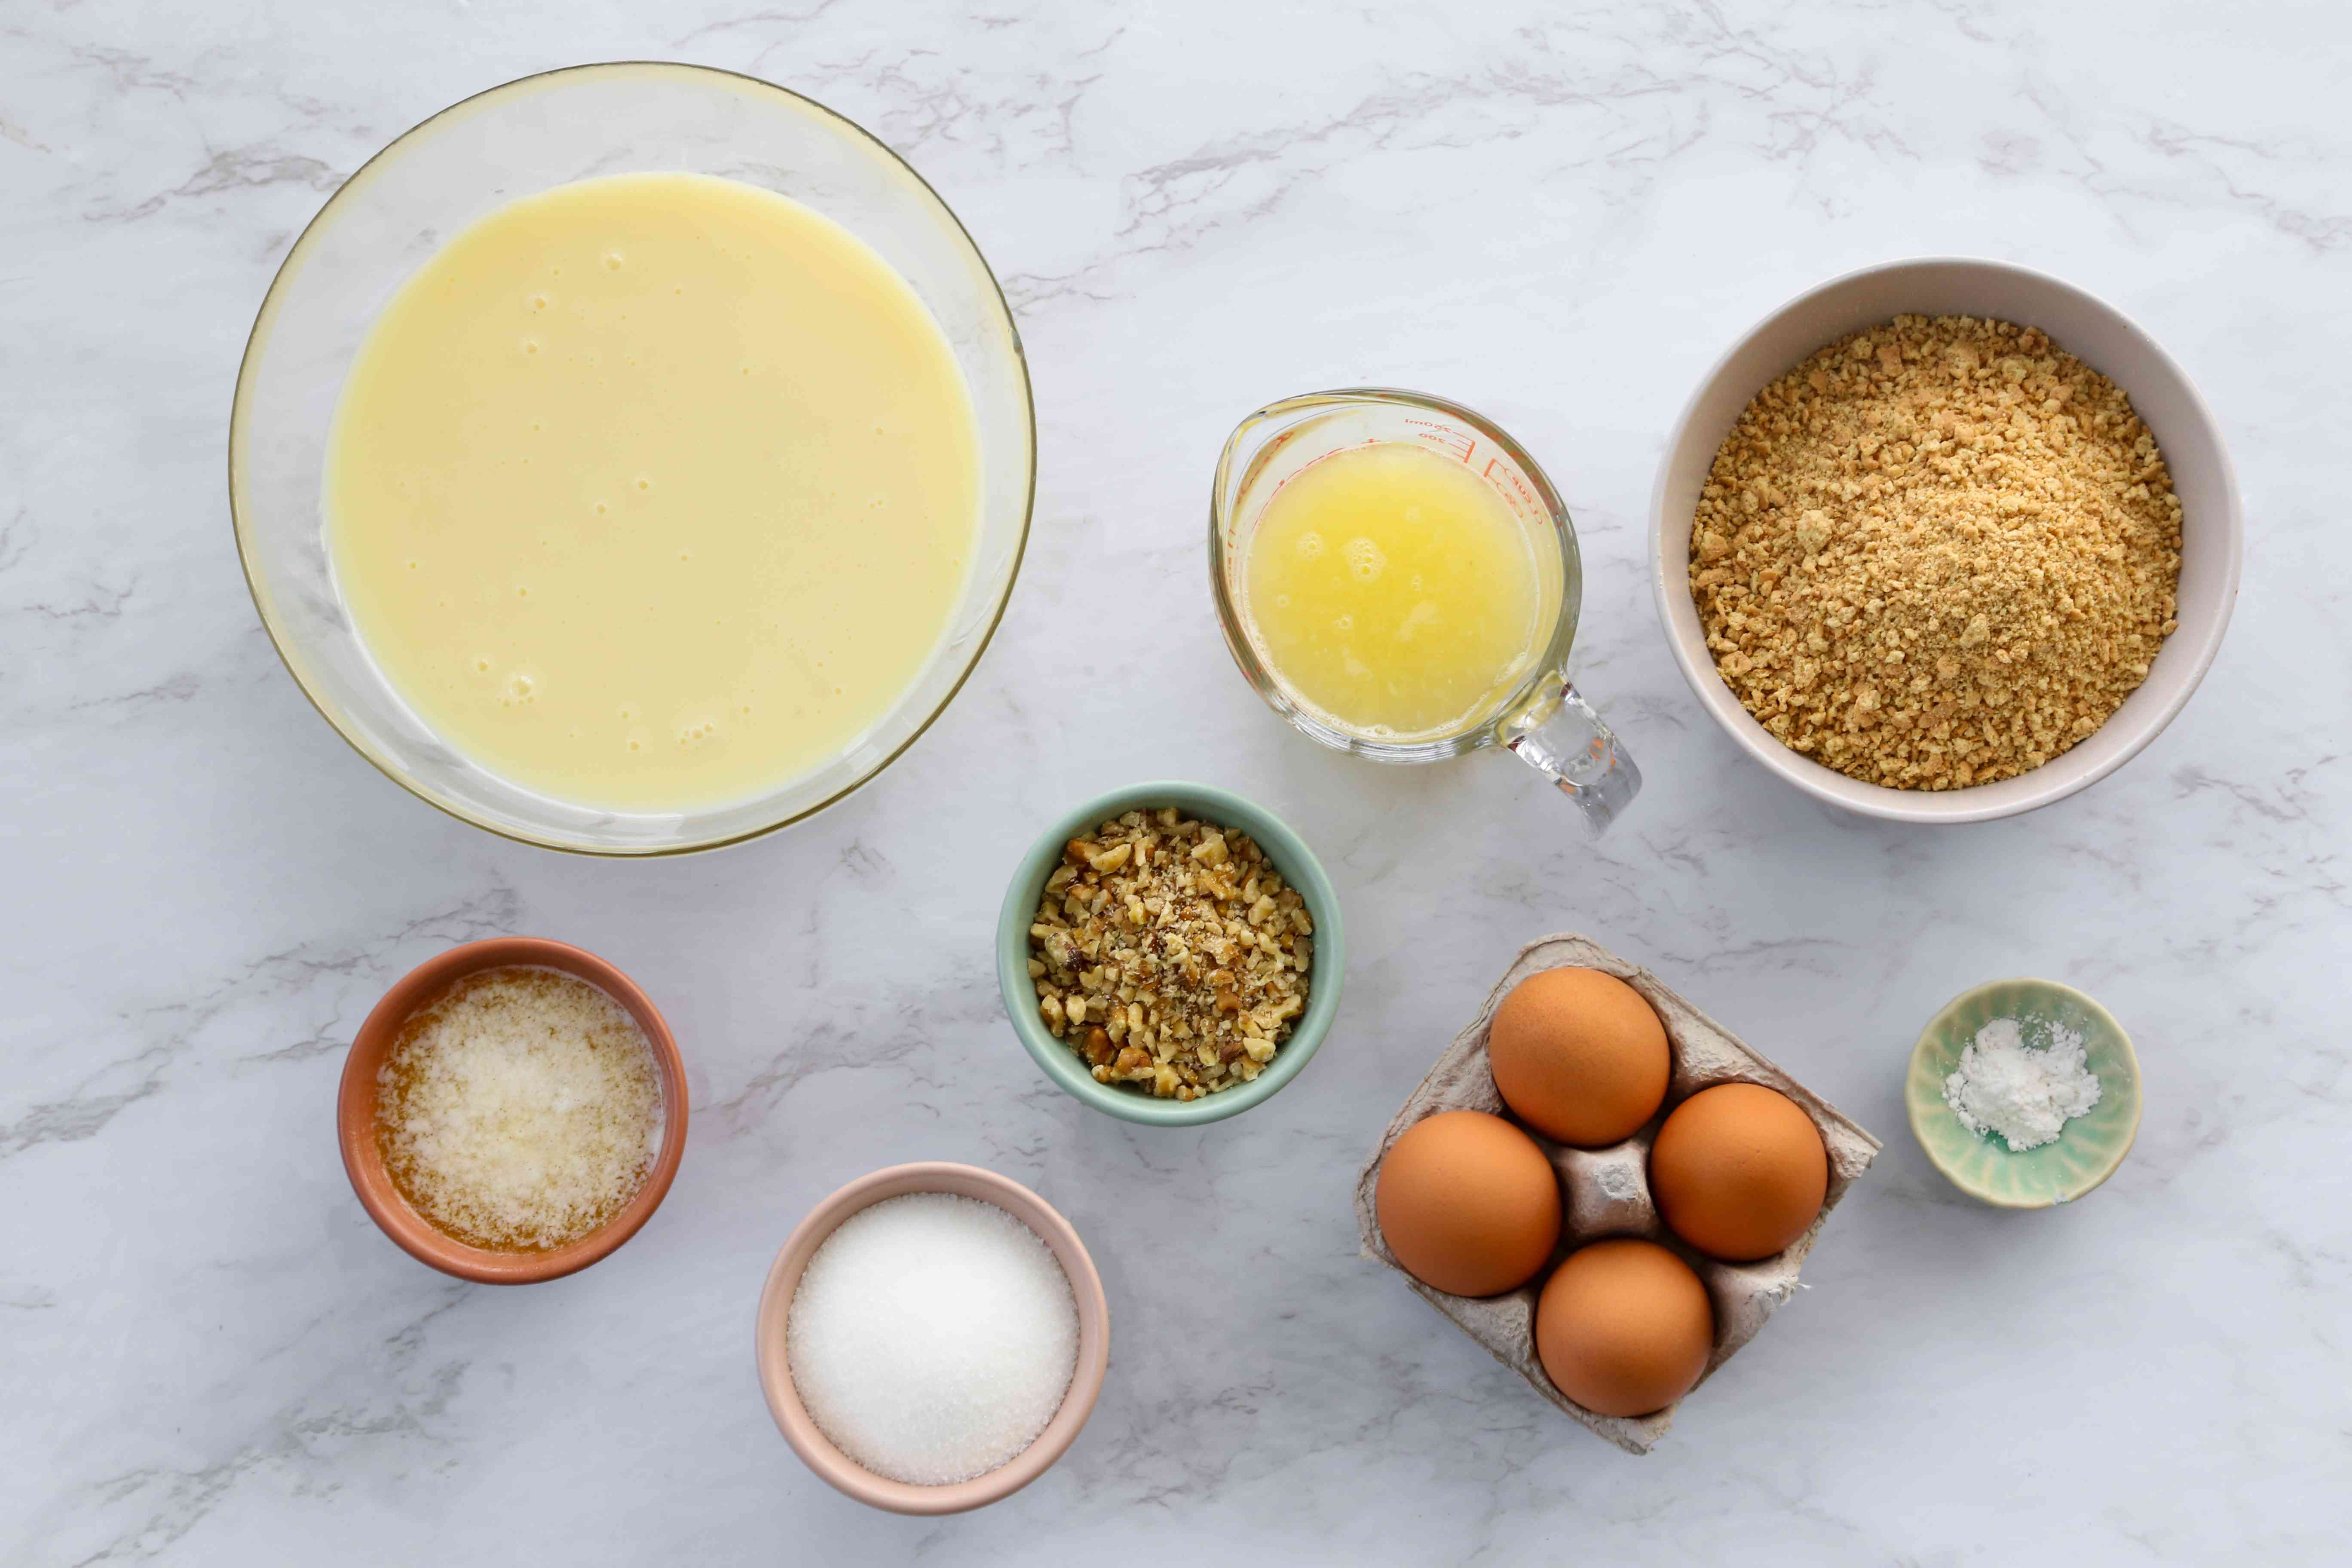 Graham Cracker Crust Lemon Meringue Pie ingredients